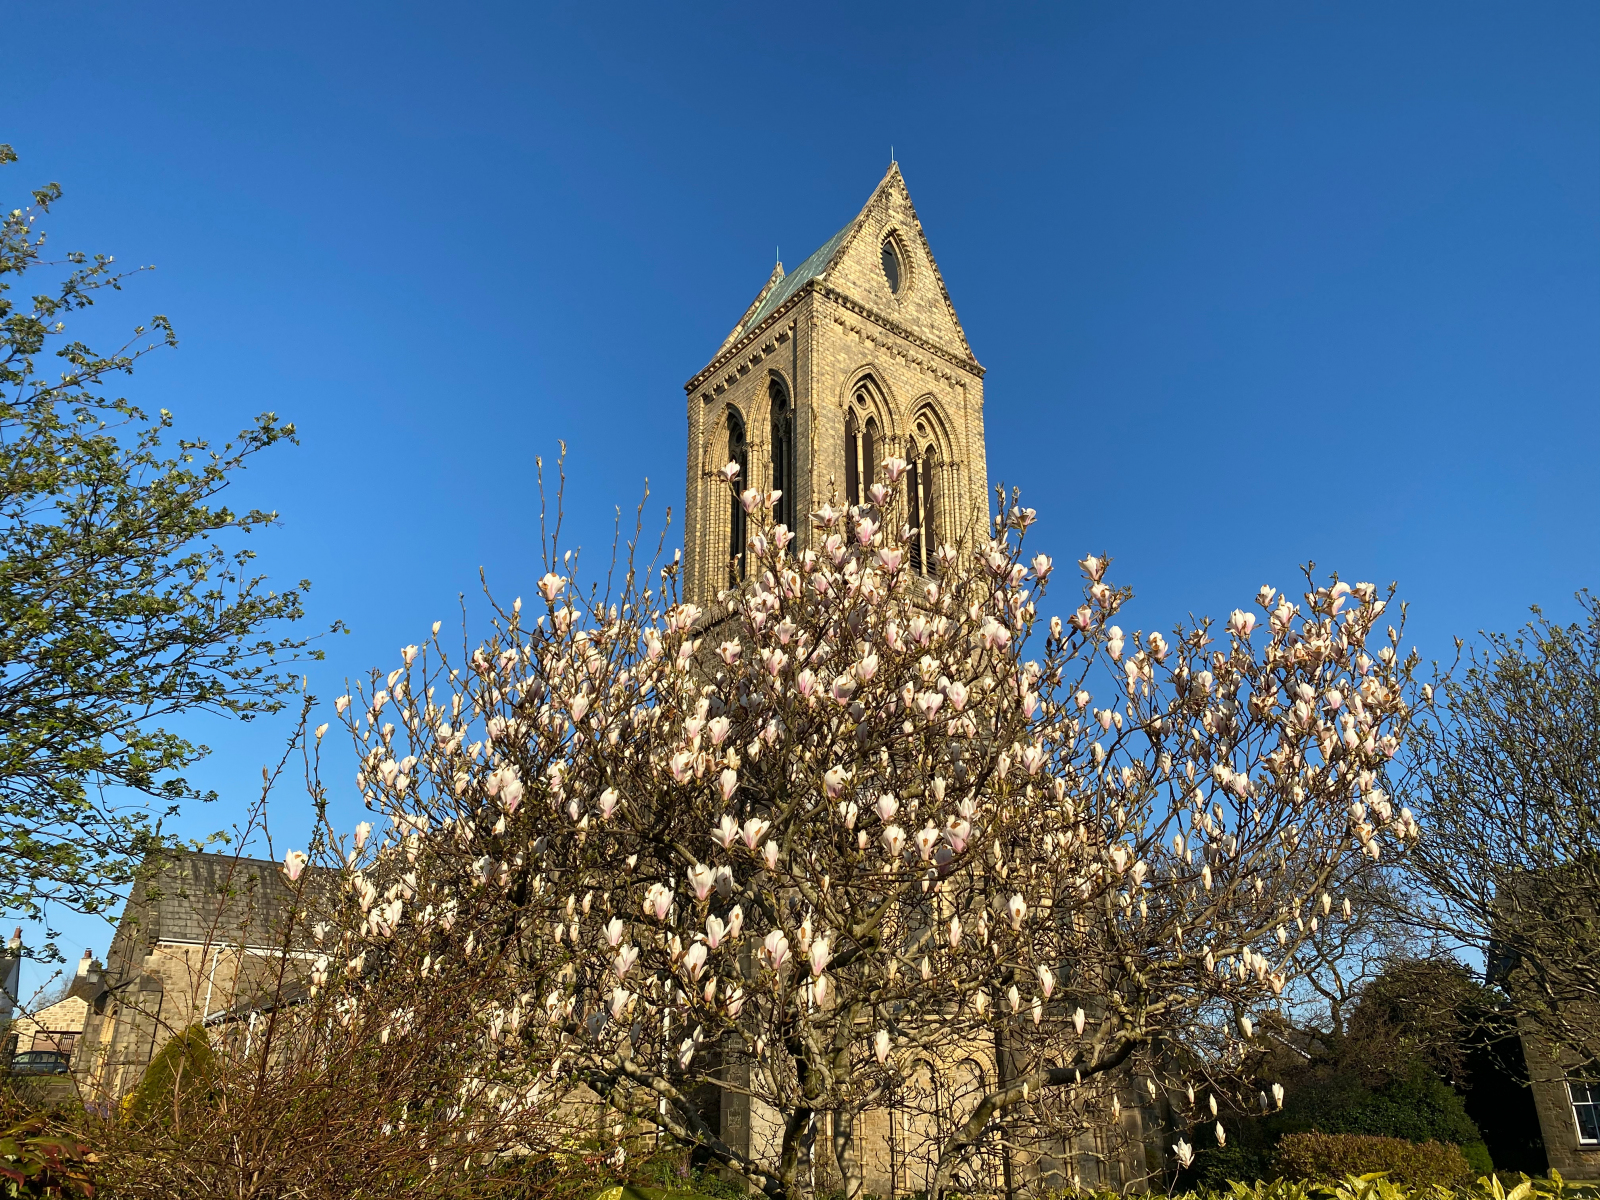 Magnolia Tree at Front